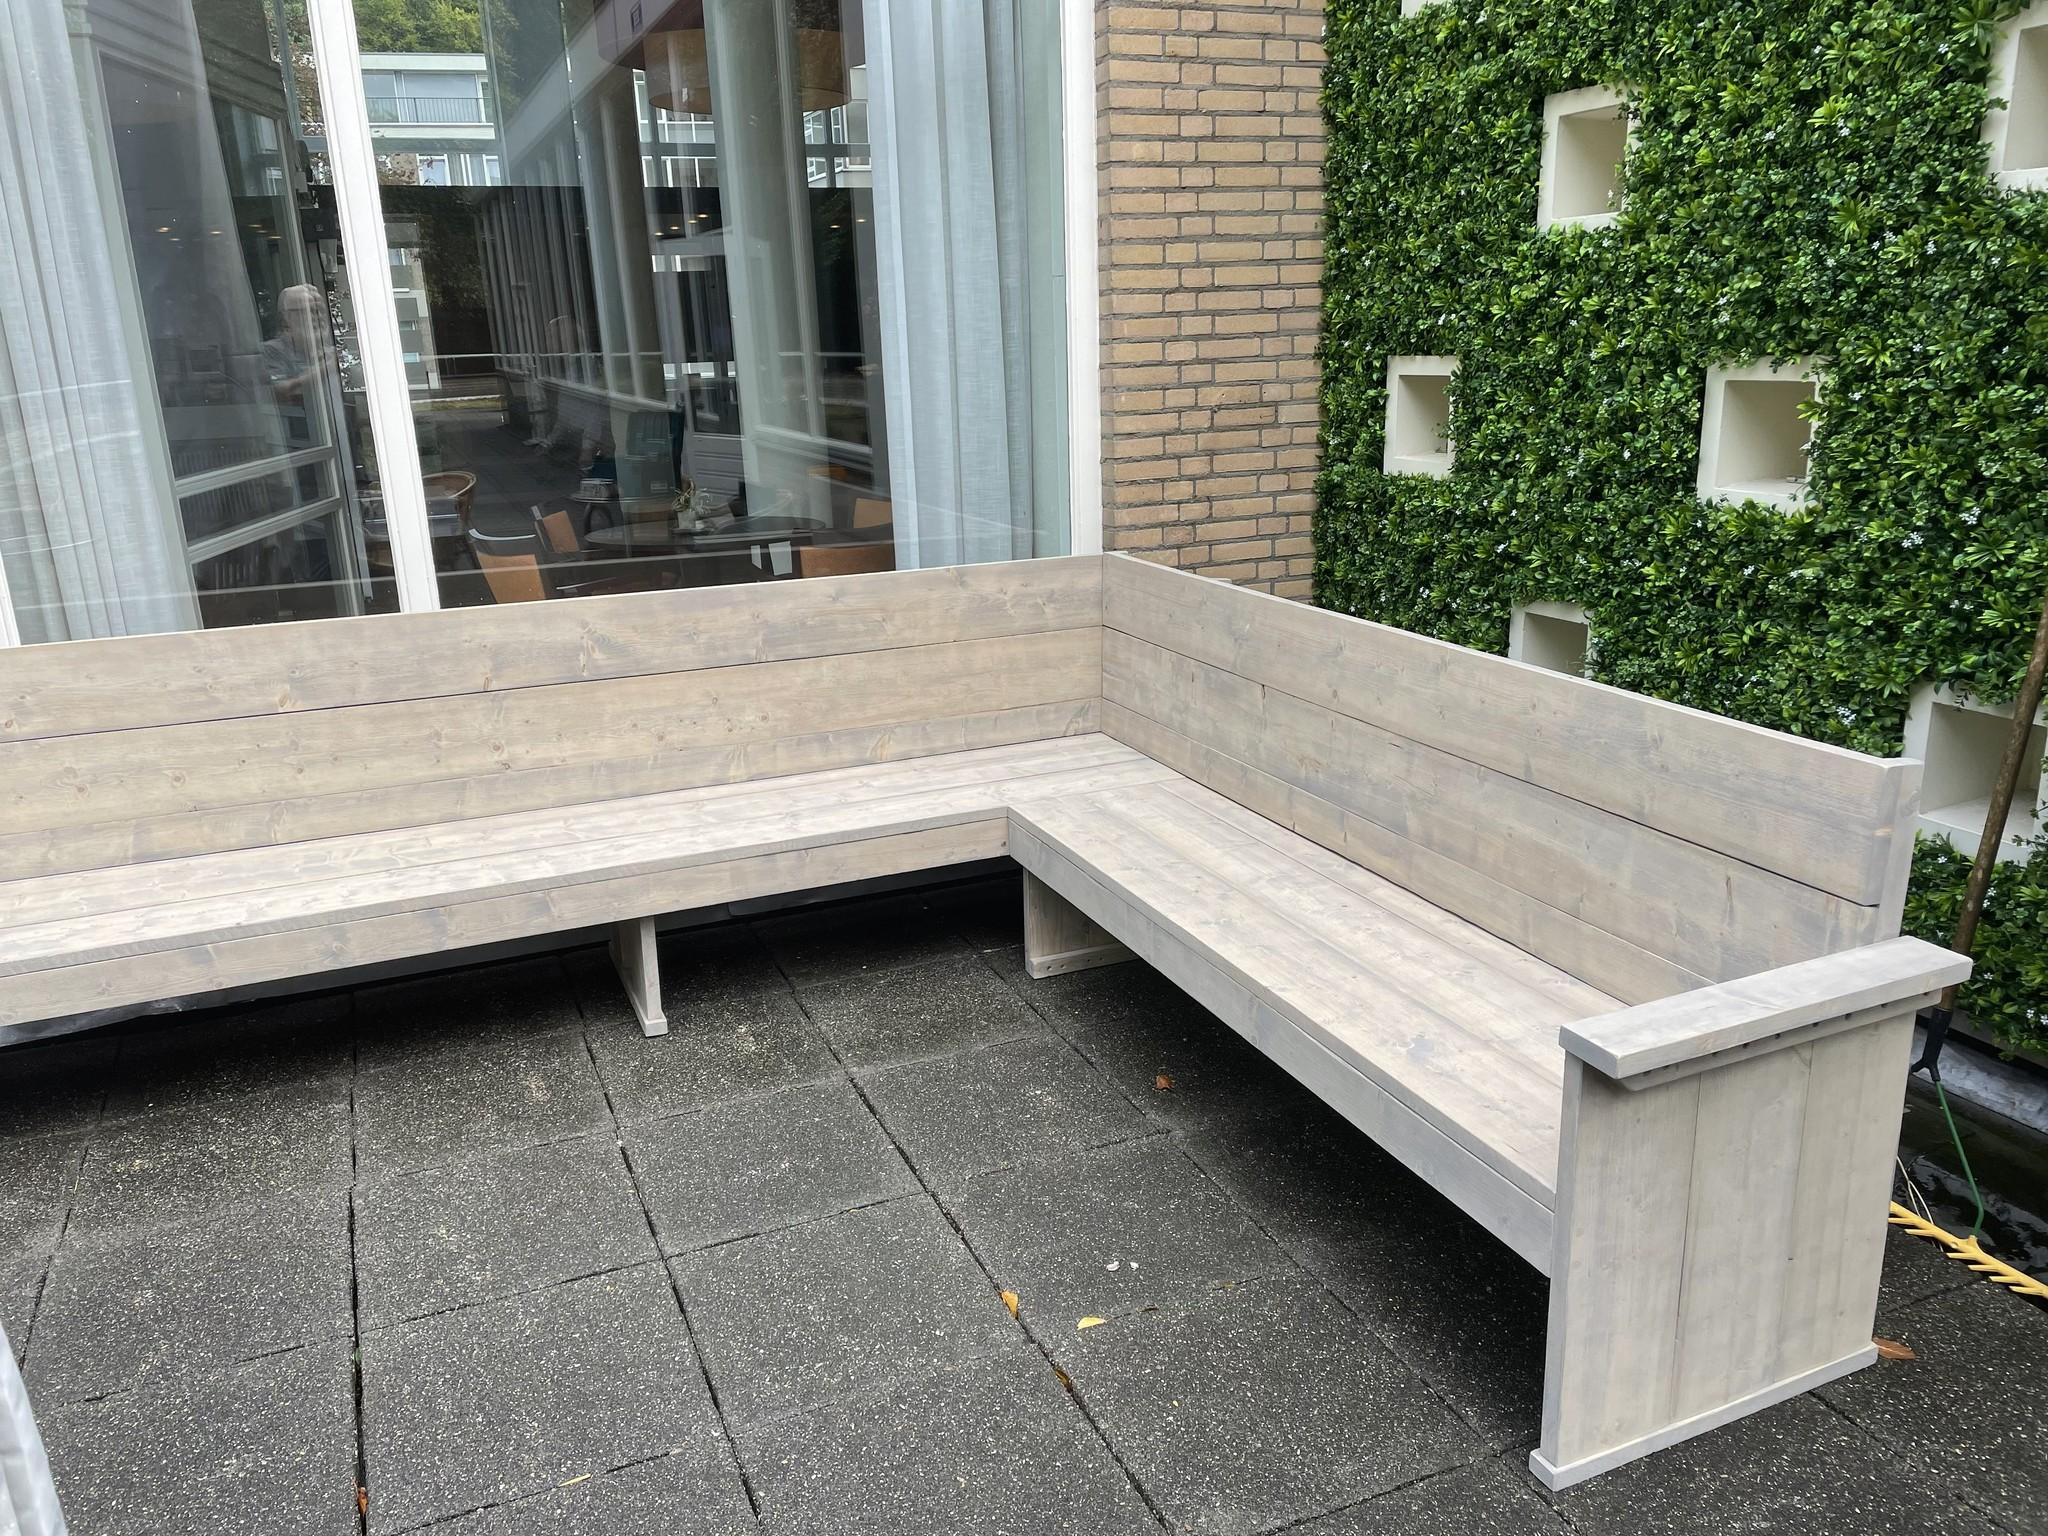 Peter Hoekbank / Terrasbank van steigerhout  op maat: Model Peter